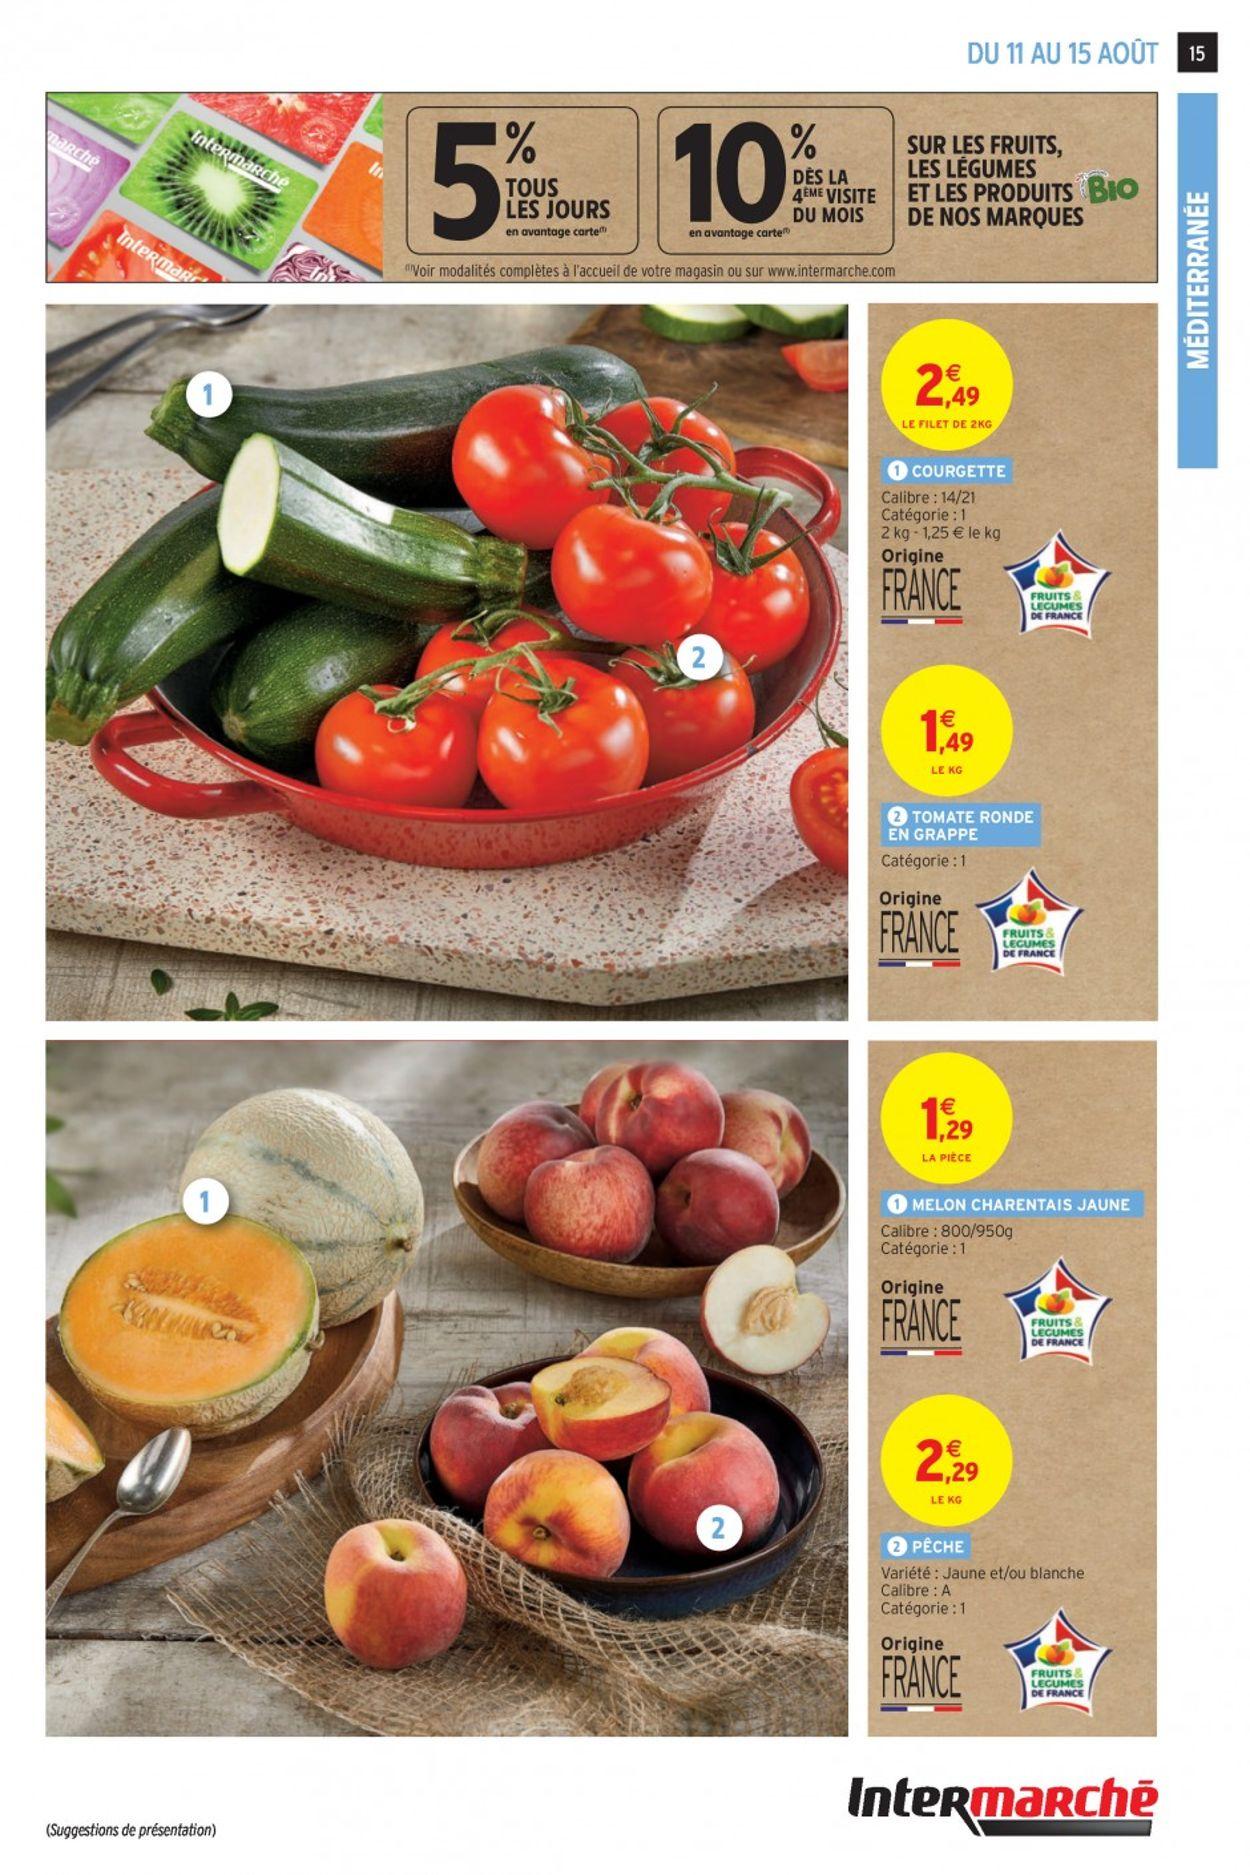 Intermarché Catalogue - 11.08-23.08.2020 (Page 15)